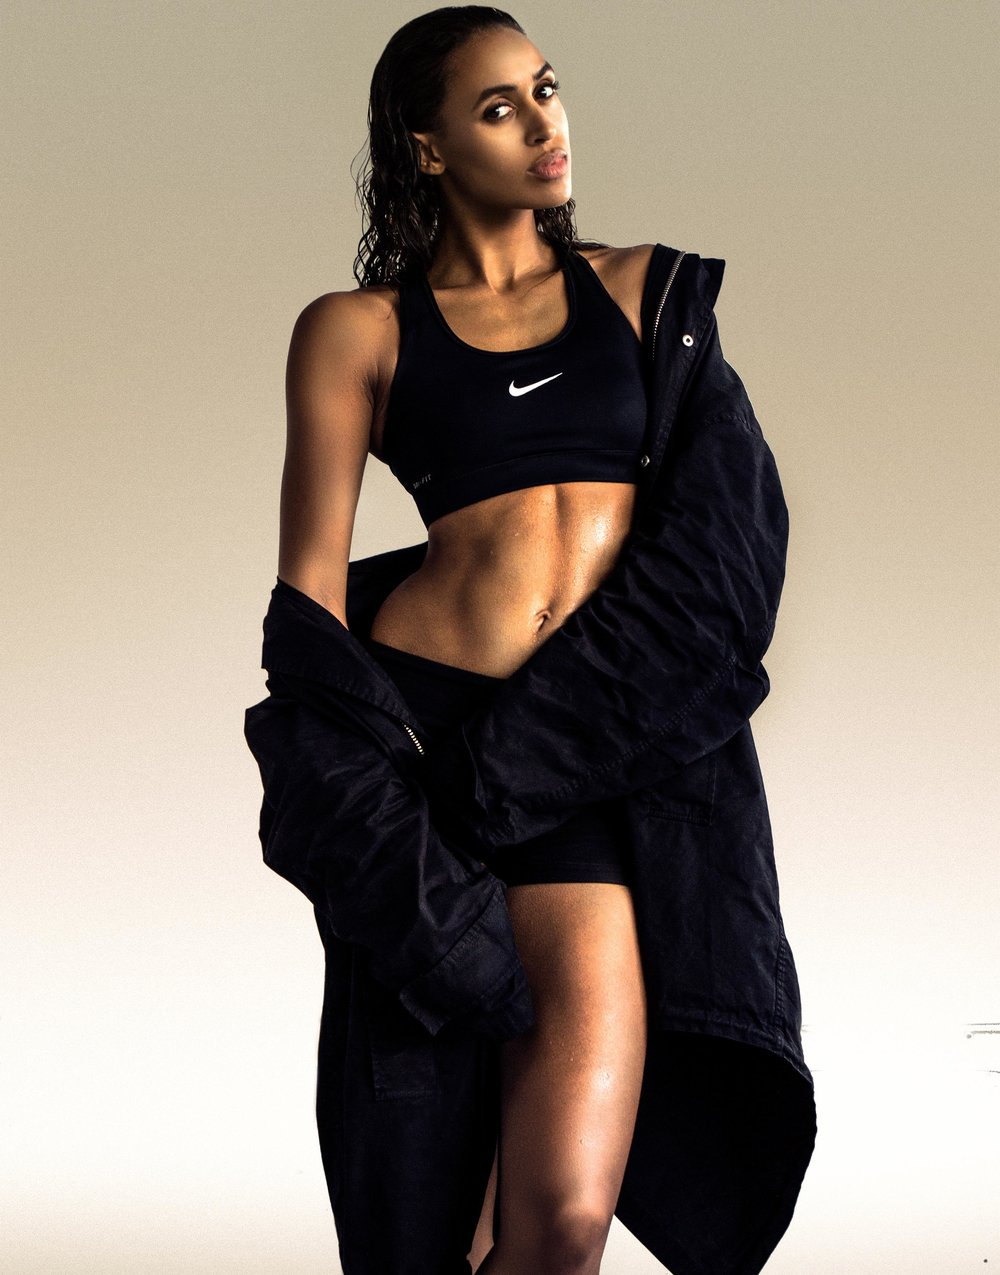 Kofi-Paintsil_Micah_Nike_017.jpg